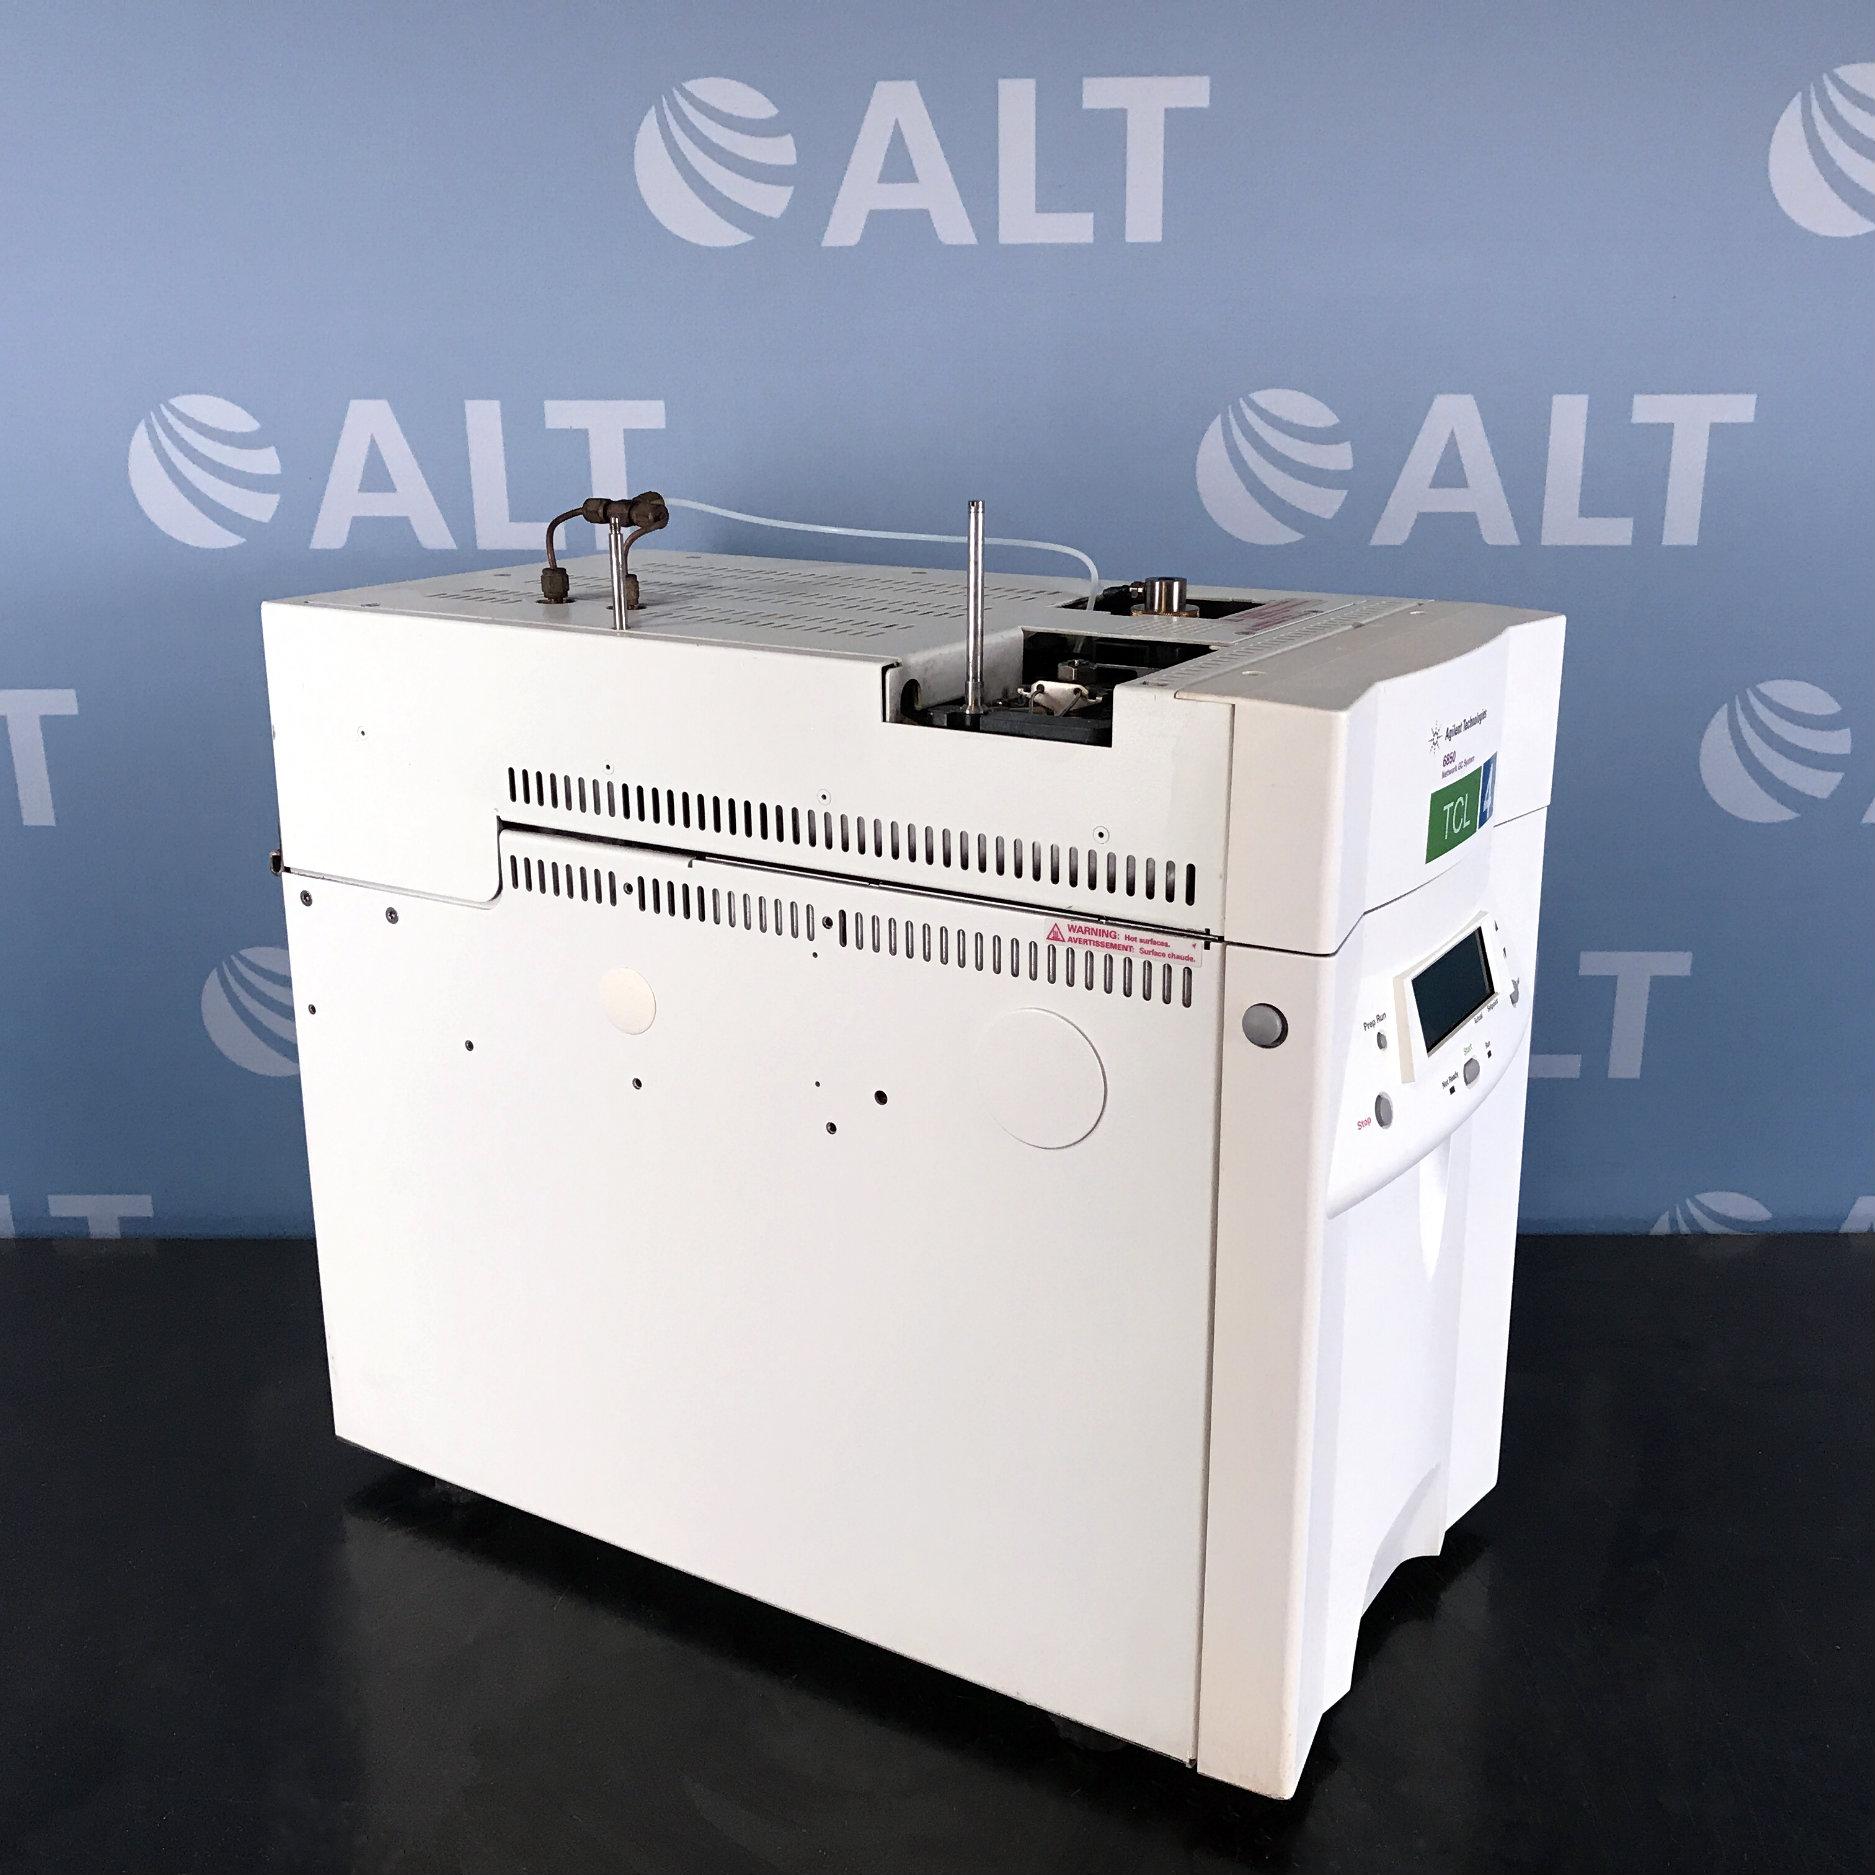 Refurbished Agilent Technologies 6850 Series Gc System